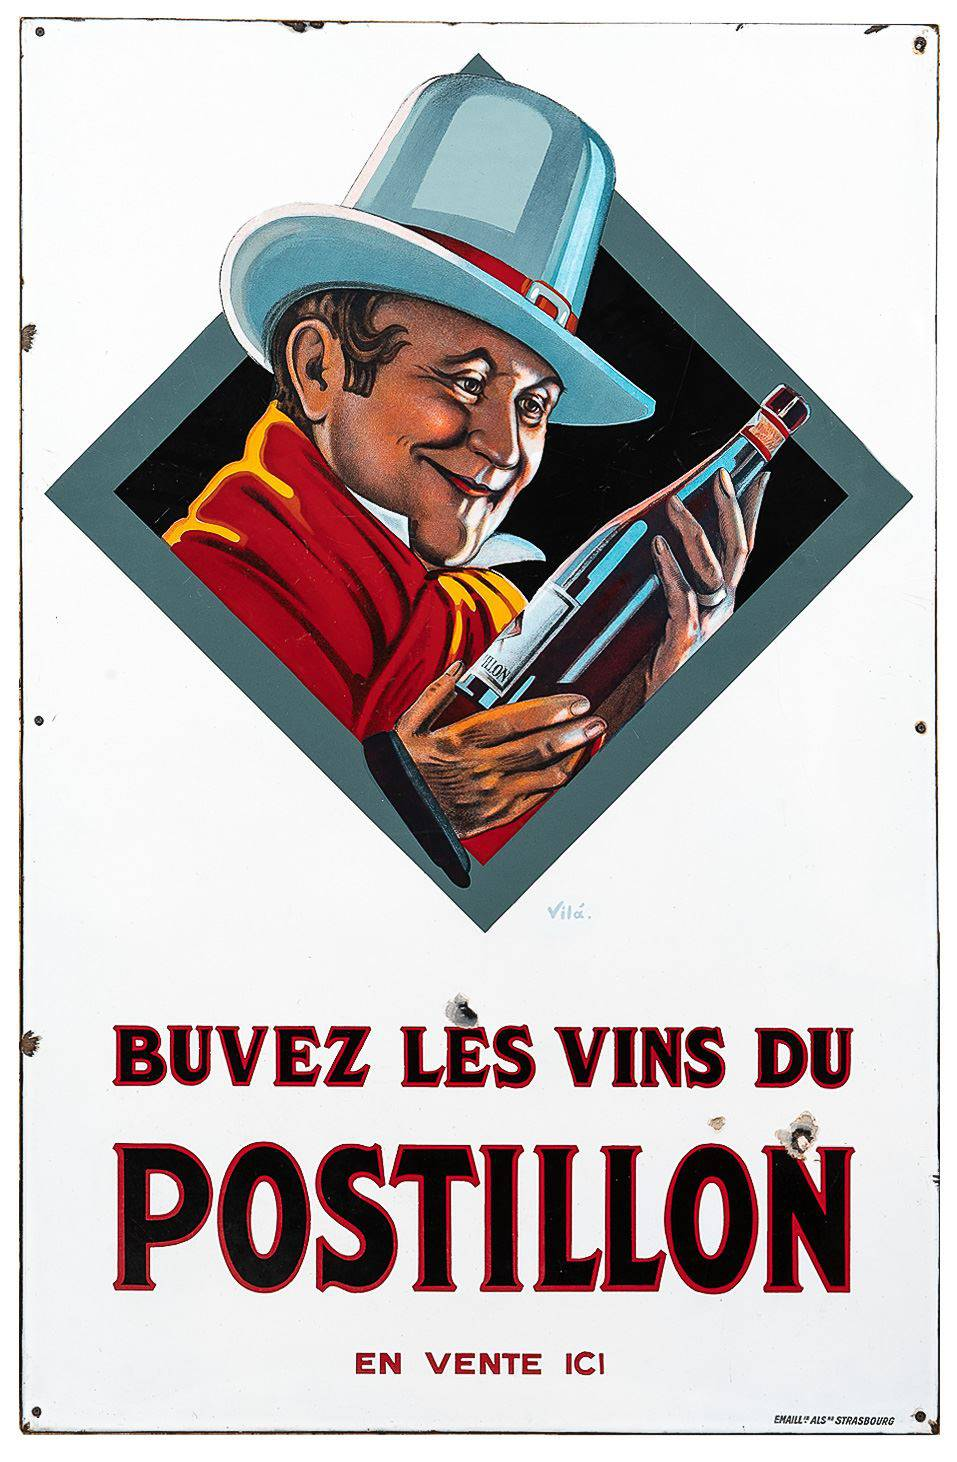 Postllion